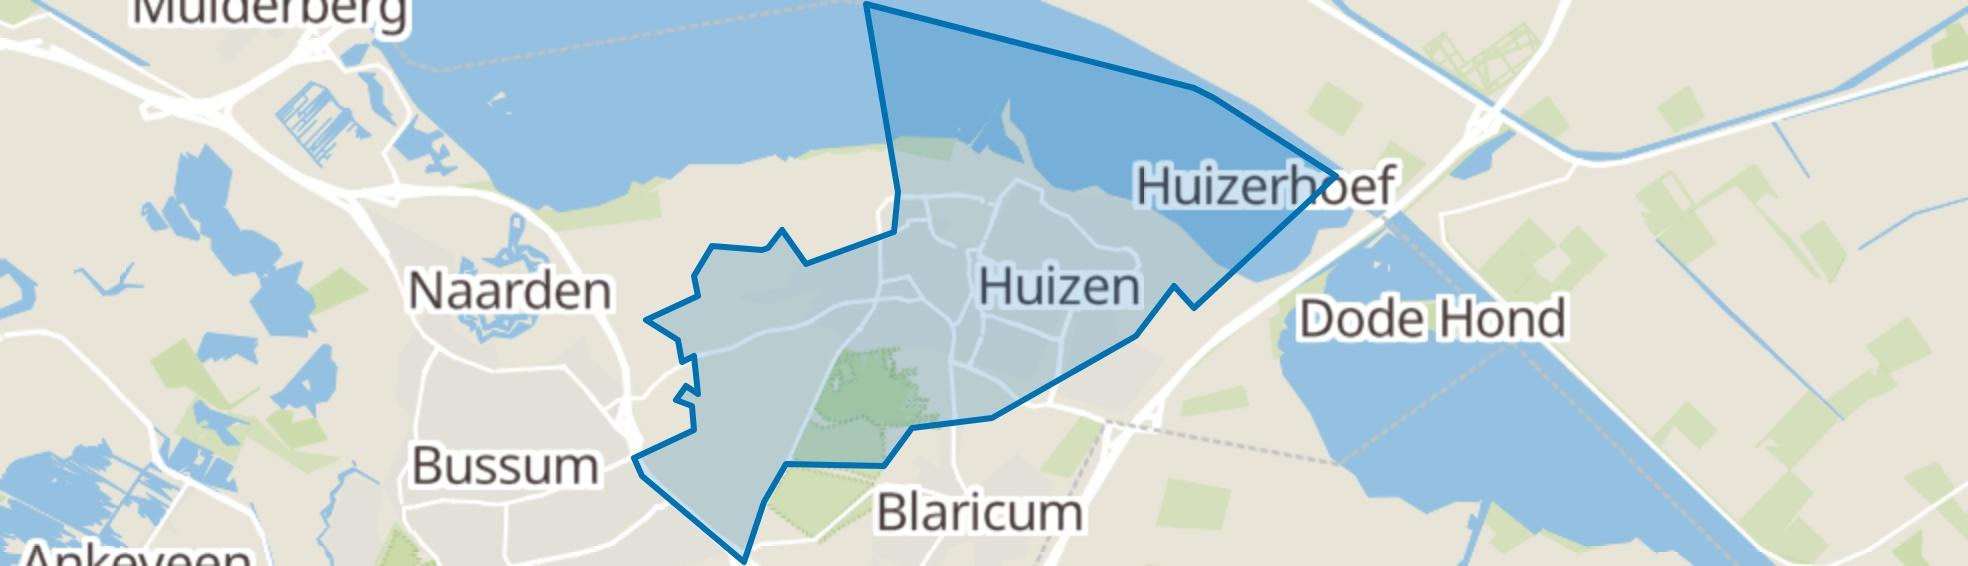 Huizen map